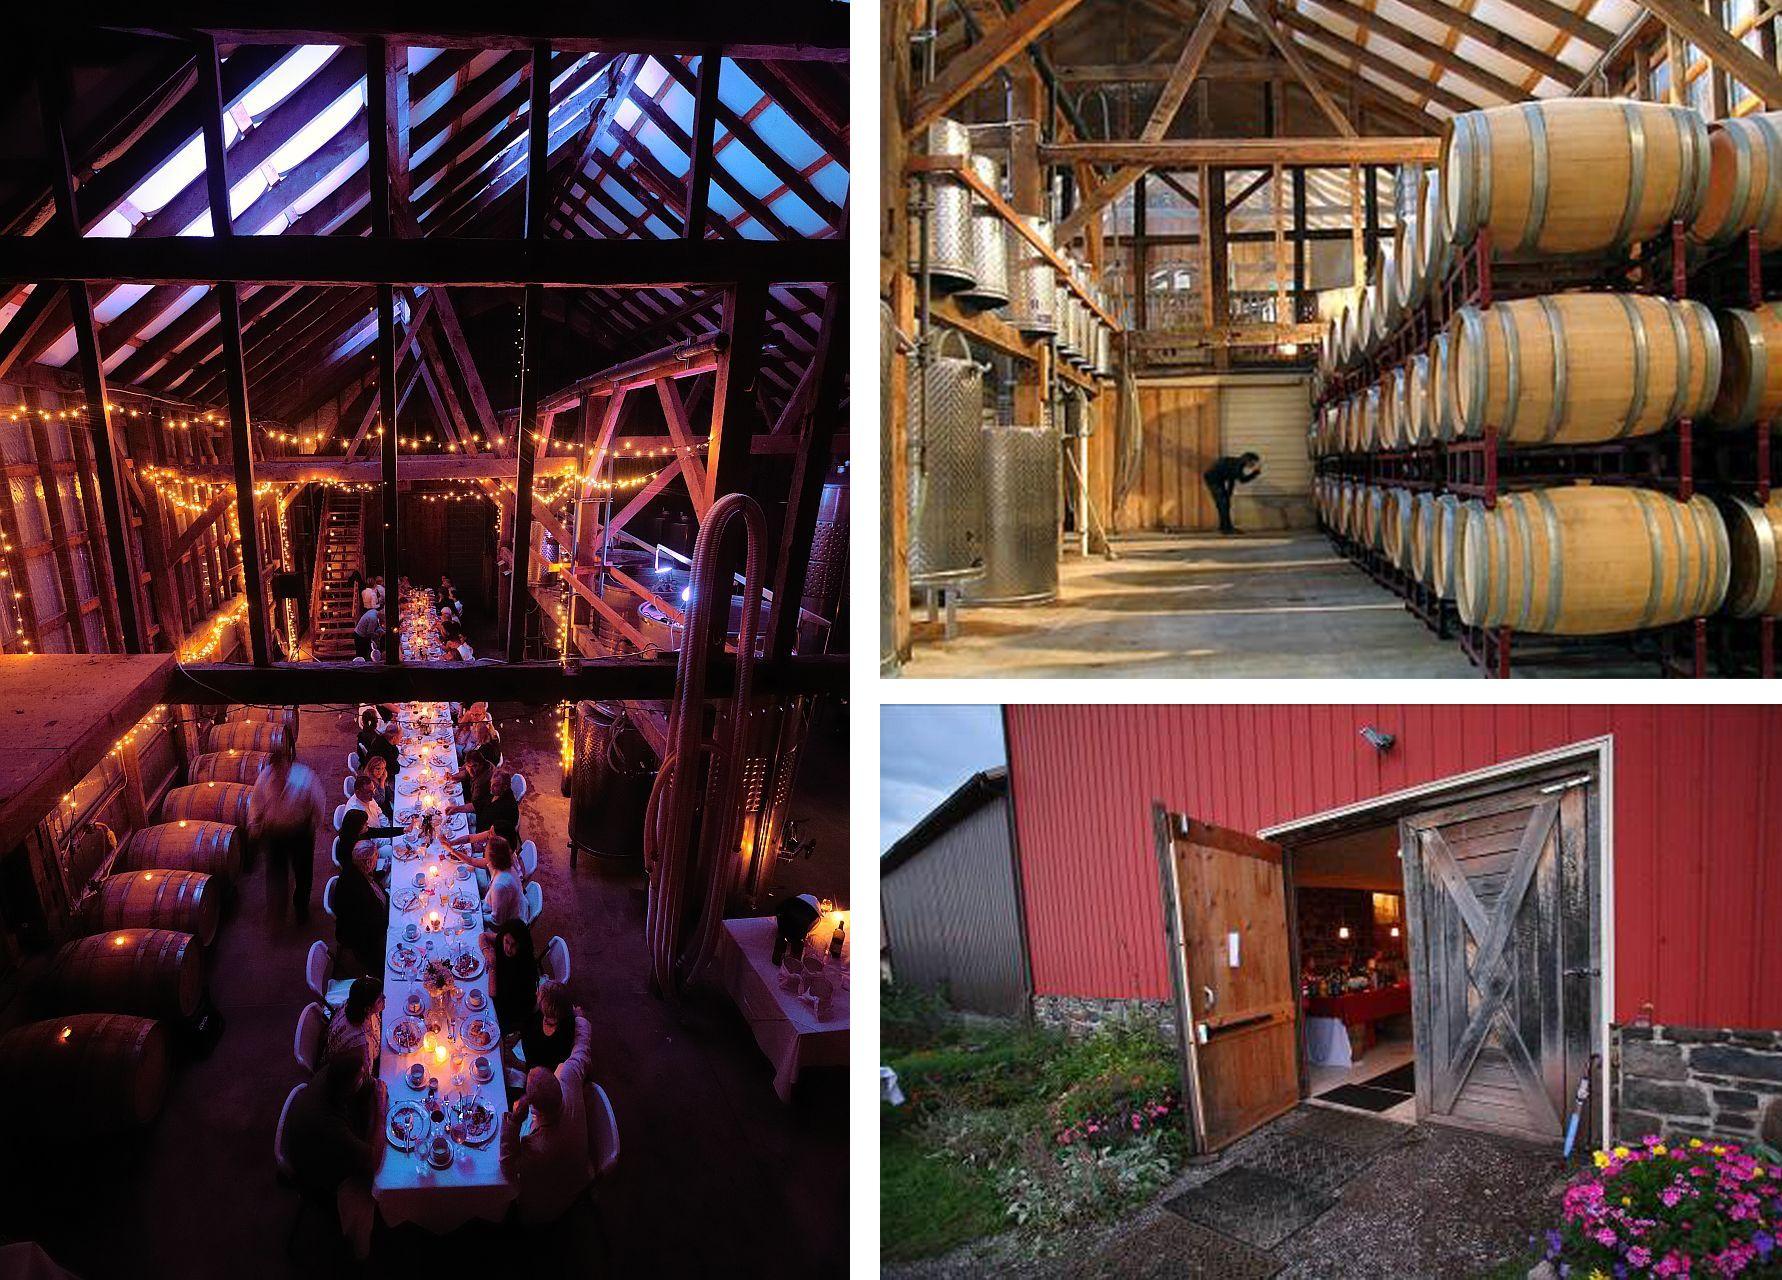 Estate weddings in nj - Unionville Vineyards Tank Room Nj Barn Weddings Other Rustic Nj Wedding Venues